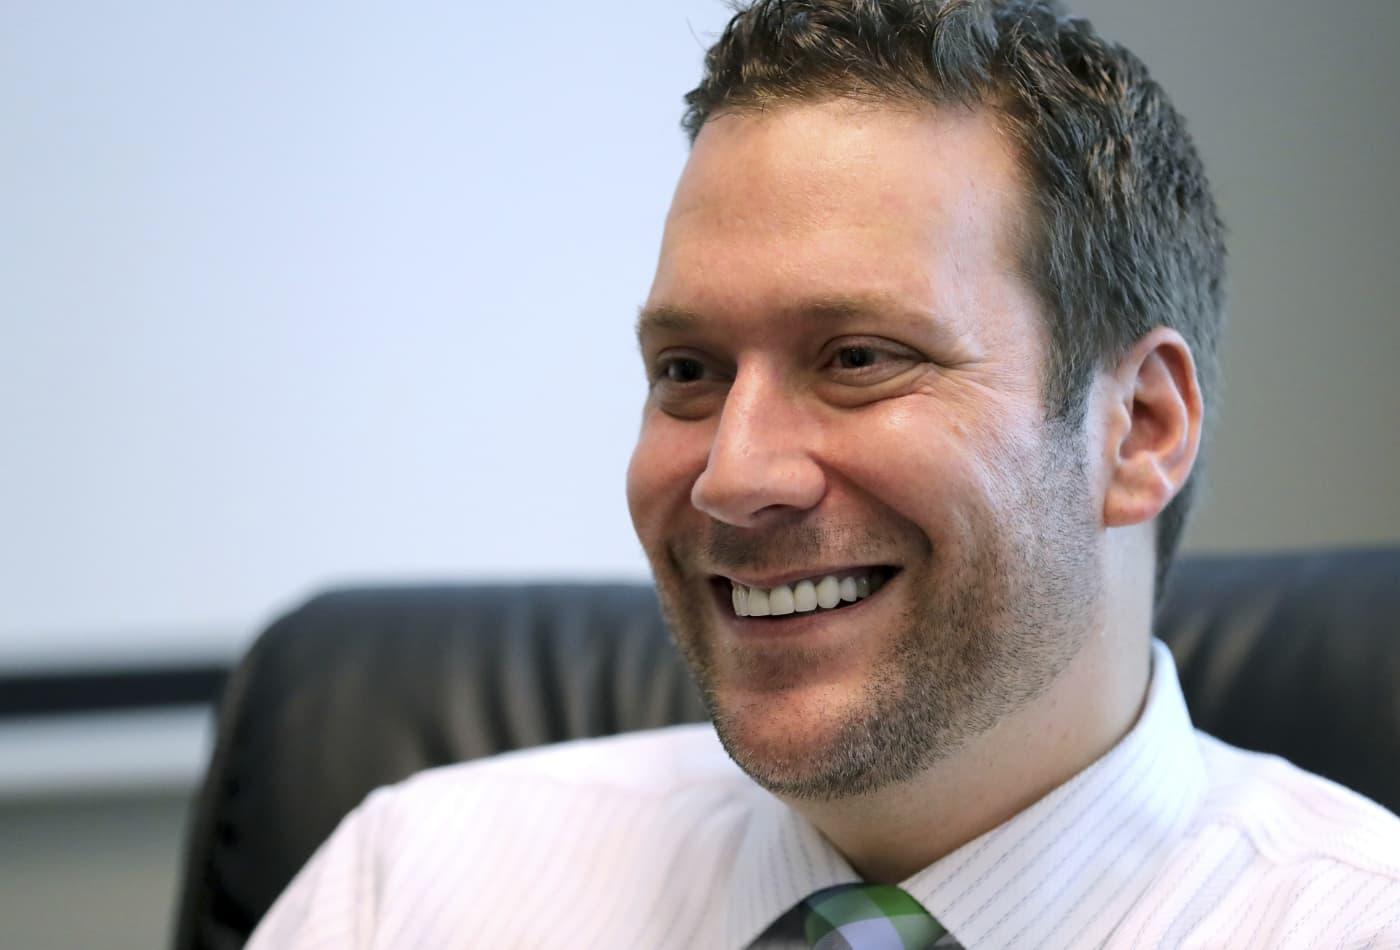 Rep. Matt Gaetz friend Joel Greenberg will plead guilty in case that led to sex traffic probe, court records show